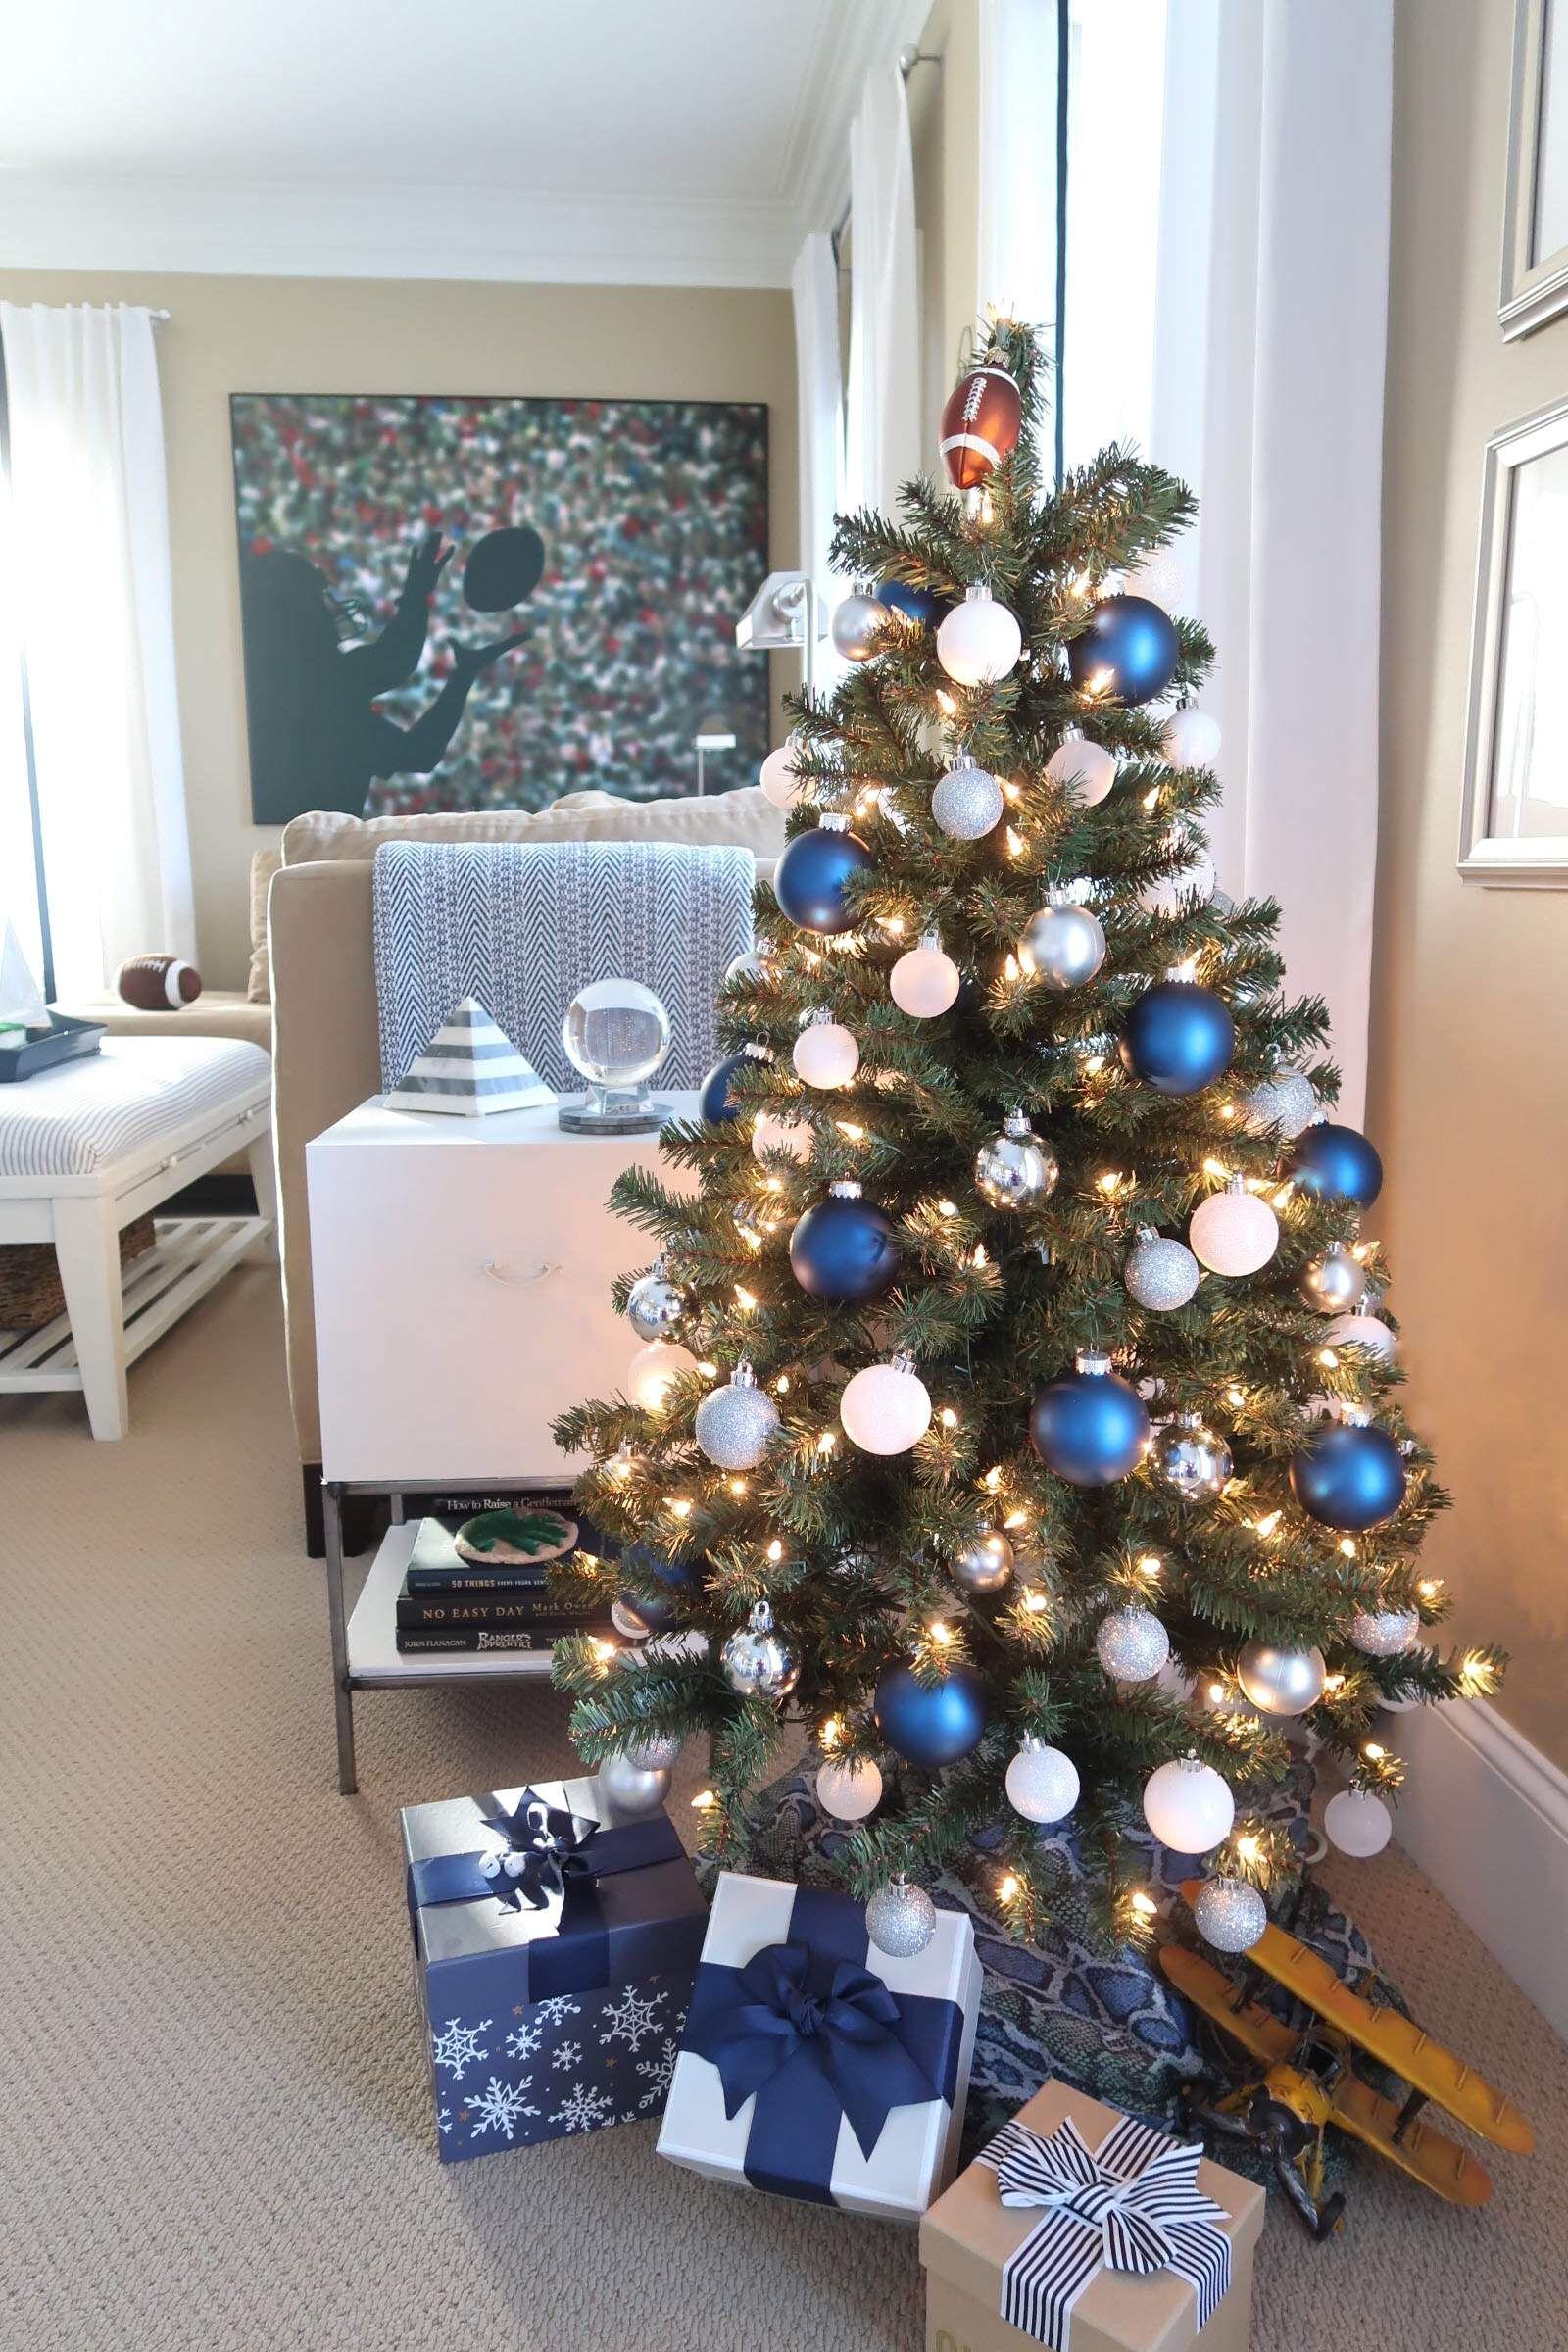 How I Organize And Store Christmas Decor Storing Christmas Decorations Christmas Tree Decorations Christmas Decorations